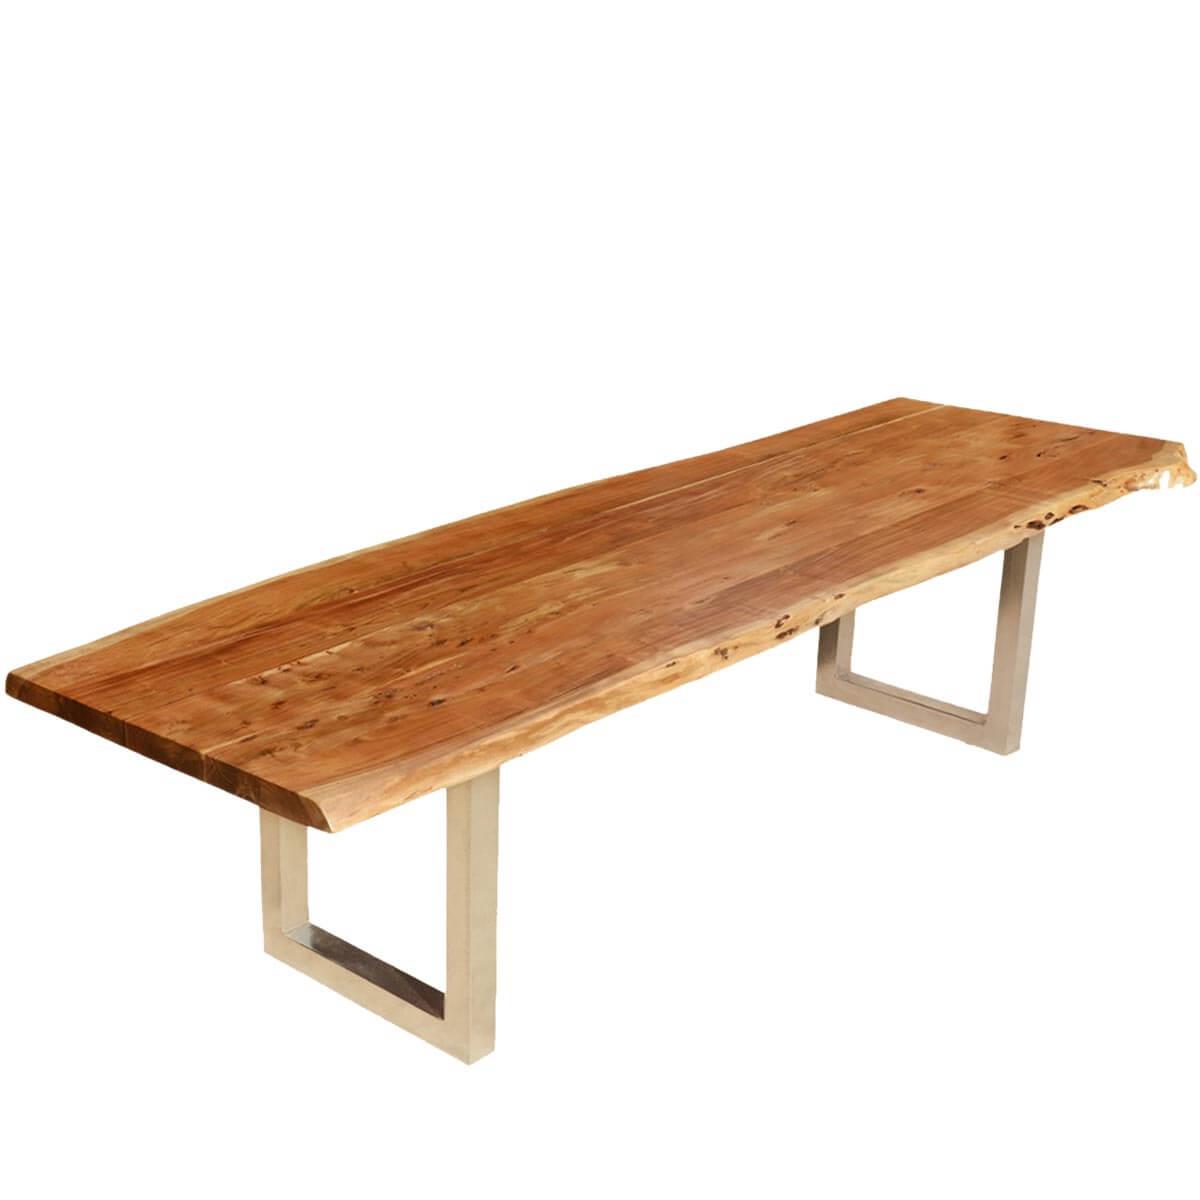 Modern Live Edge Dining Table Acacia Wood & Iron